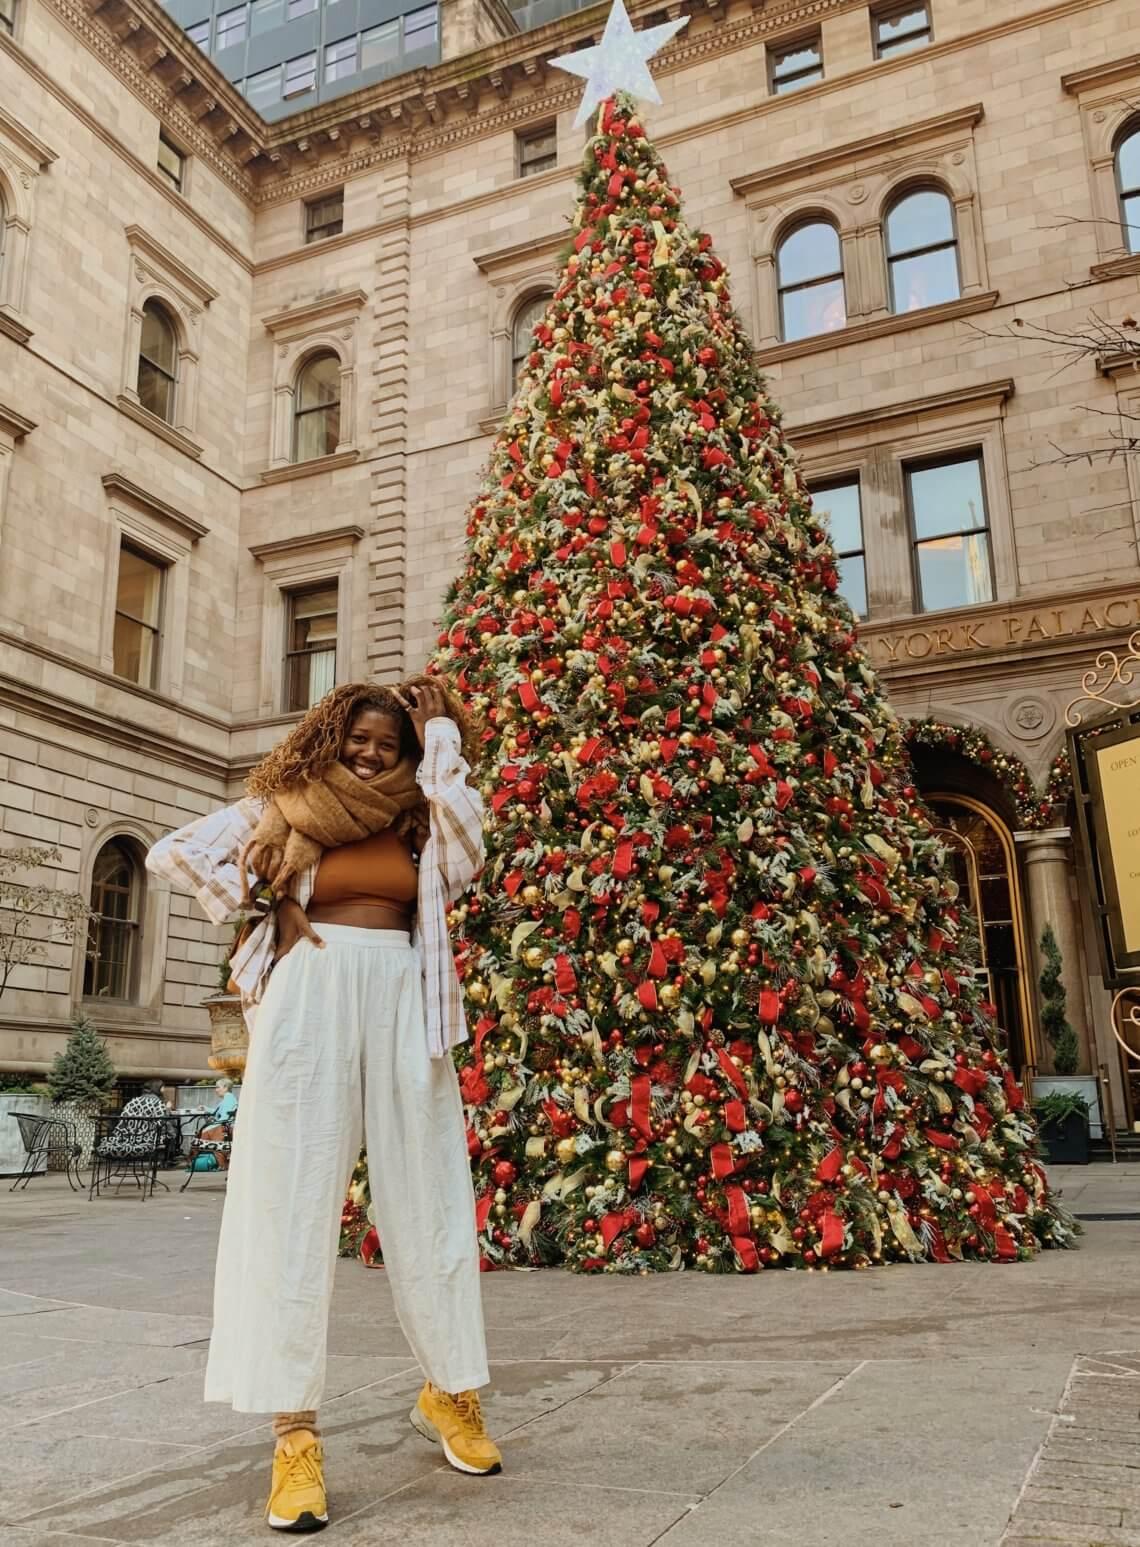 CHRISTMAS TREE LIGHTING IN NYC